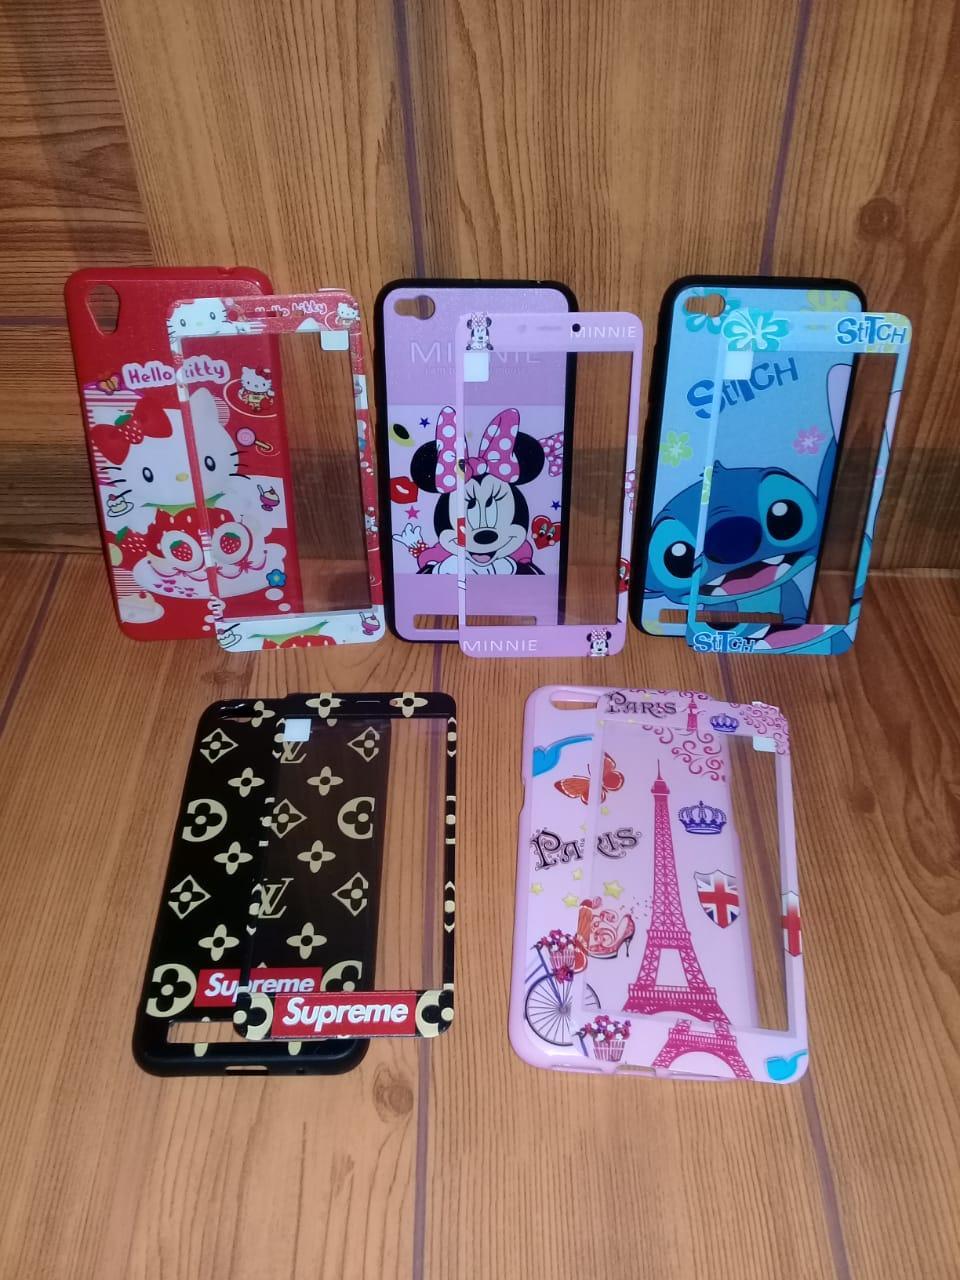 Jual Case Karakter One Murah Garansi Dan Berkualitas Id Store Softcase Jelly Timbul Glosy Xiaomi Redmi 4a Rp 34500